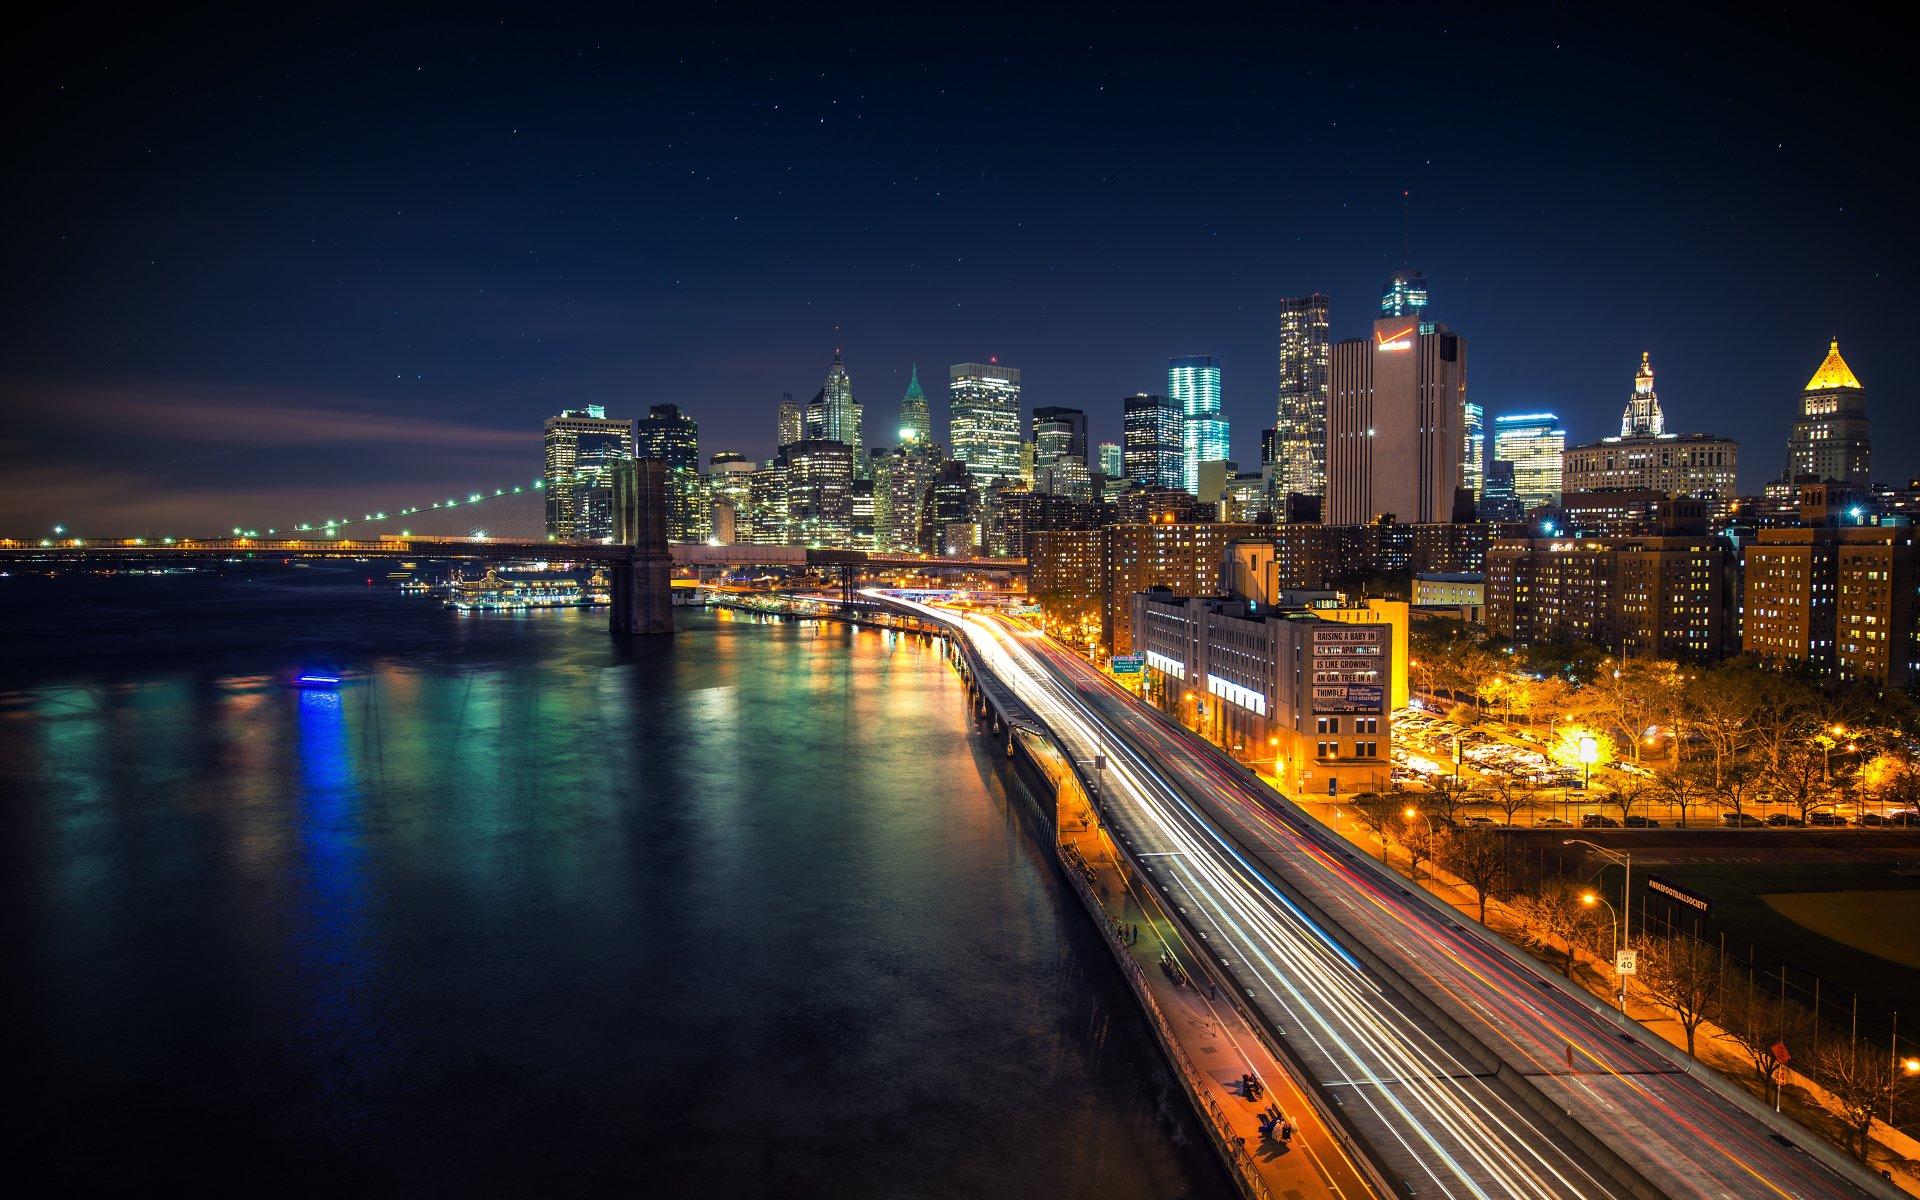 108 4K Ultra HD City Wallpapers